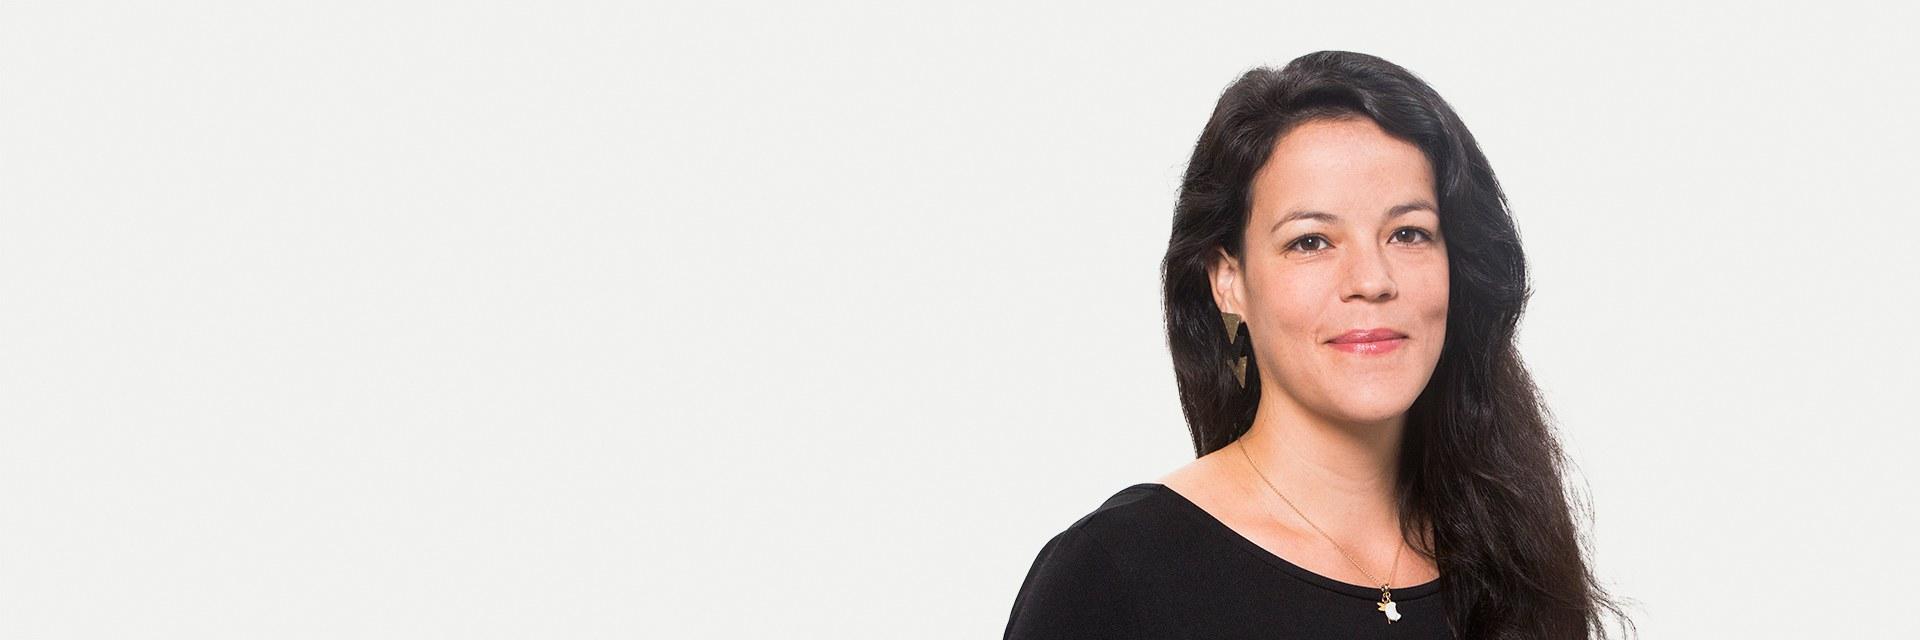 Daniela Pavia Santolamazza